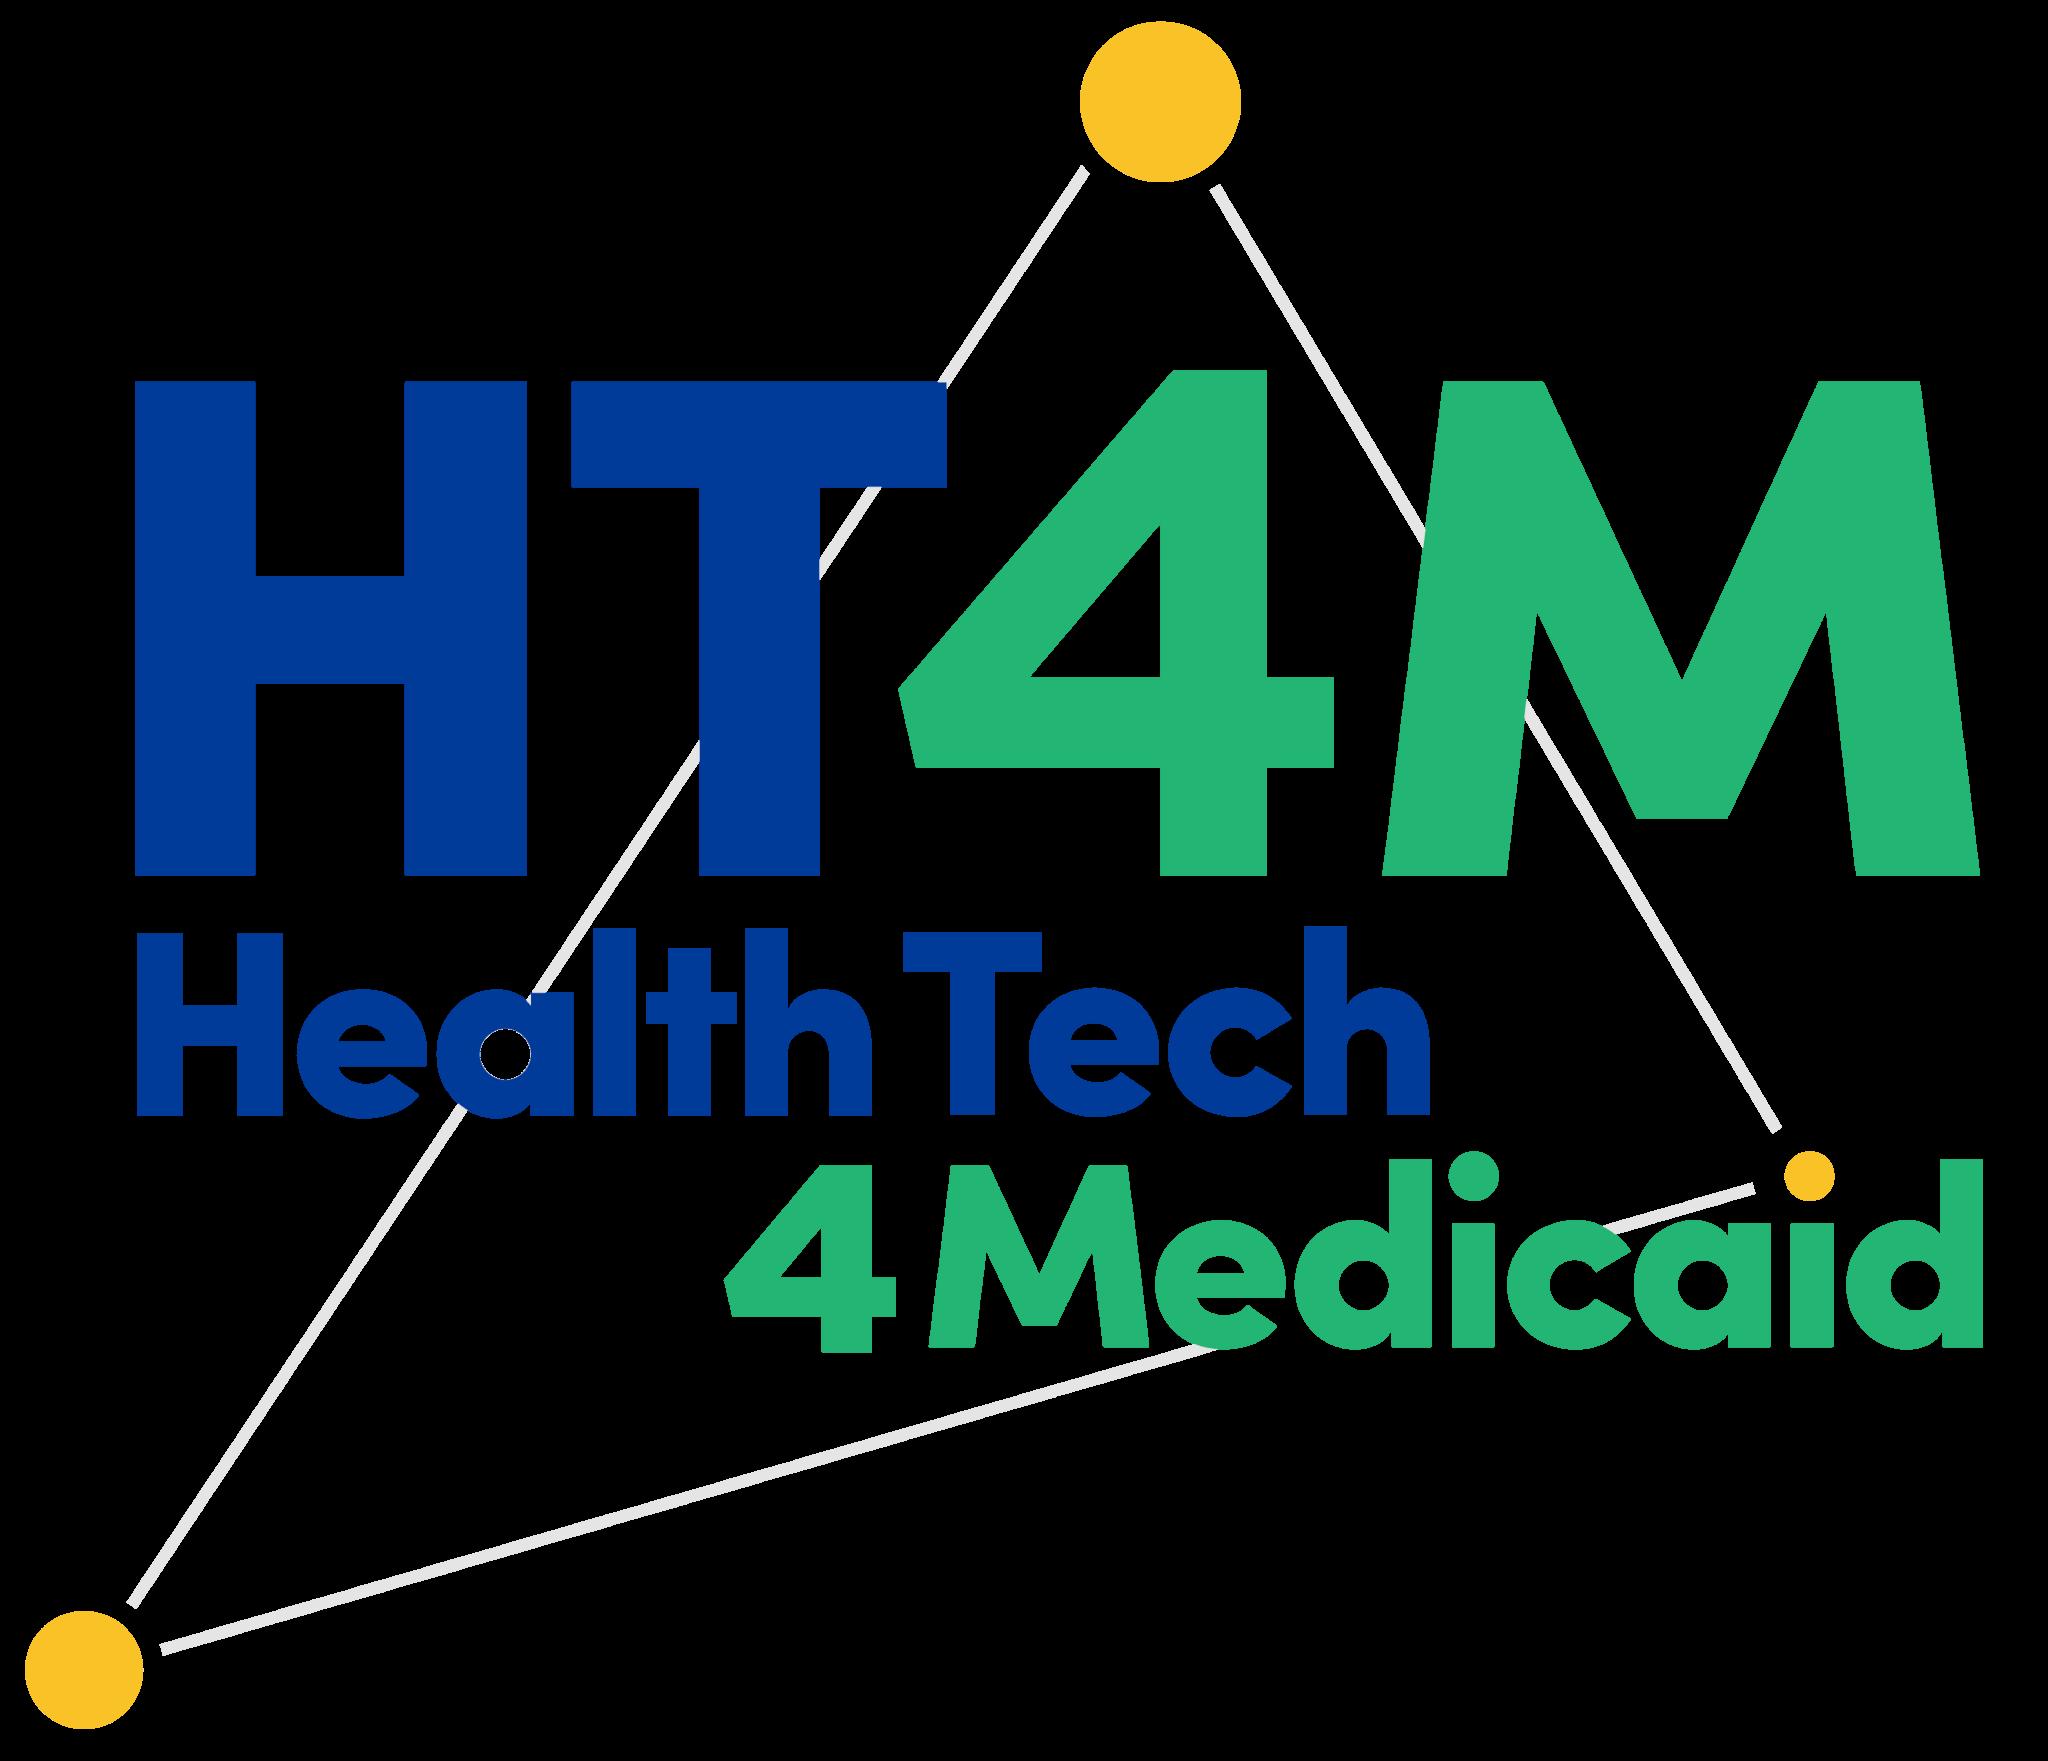 Health Tech for medicaid